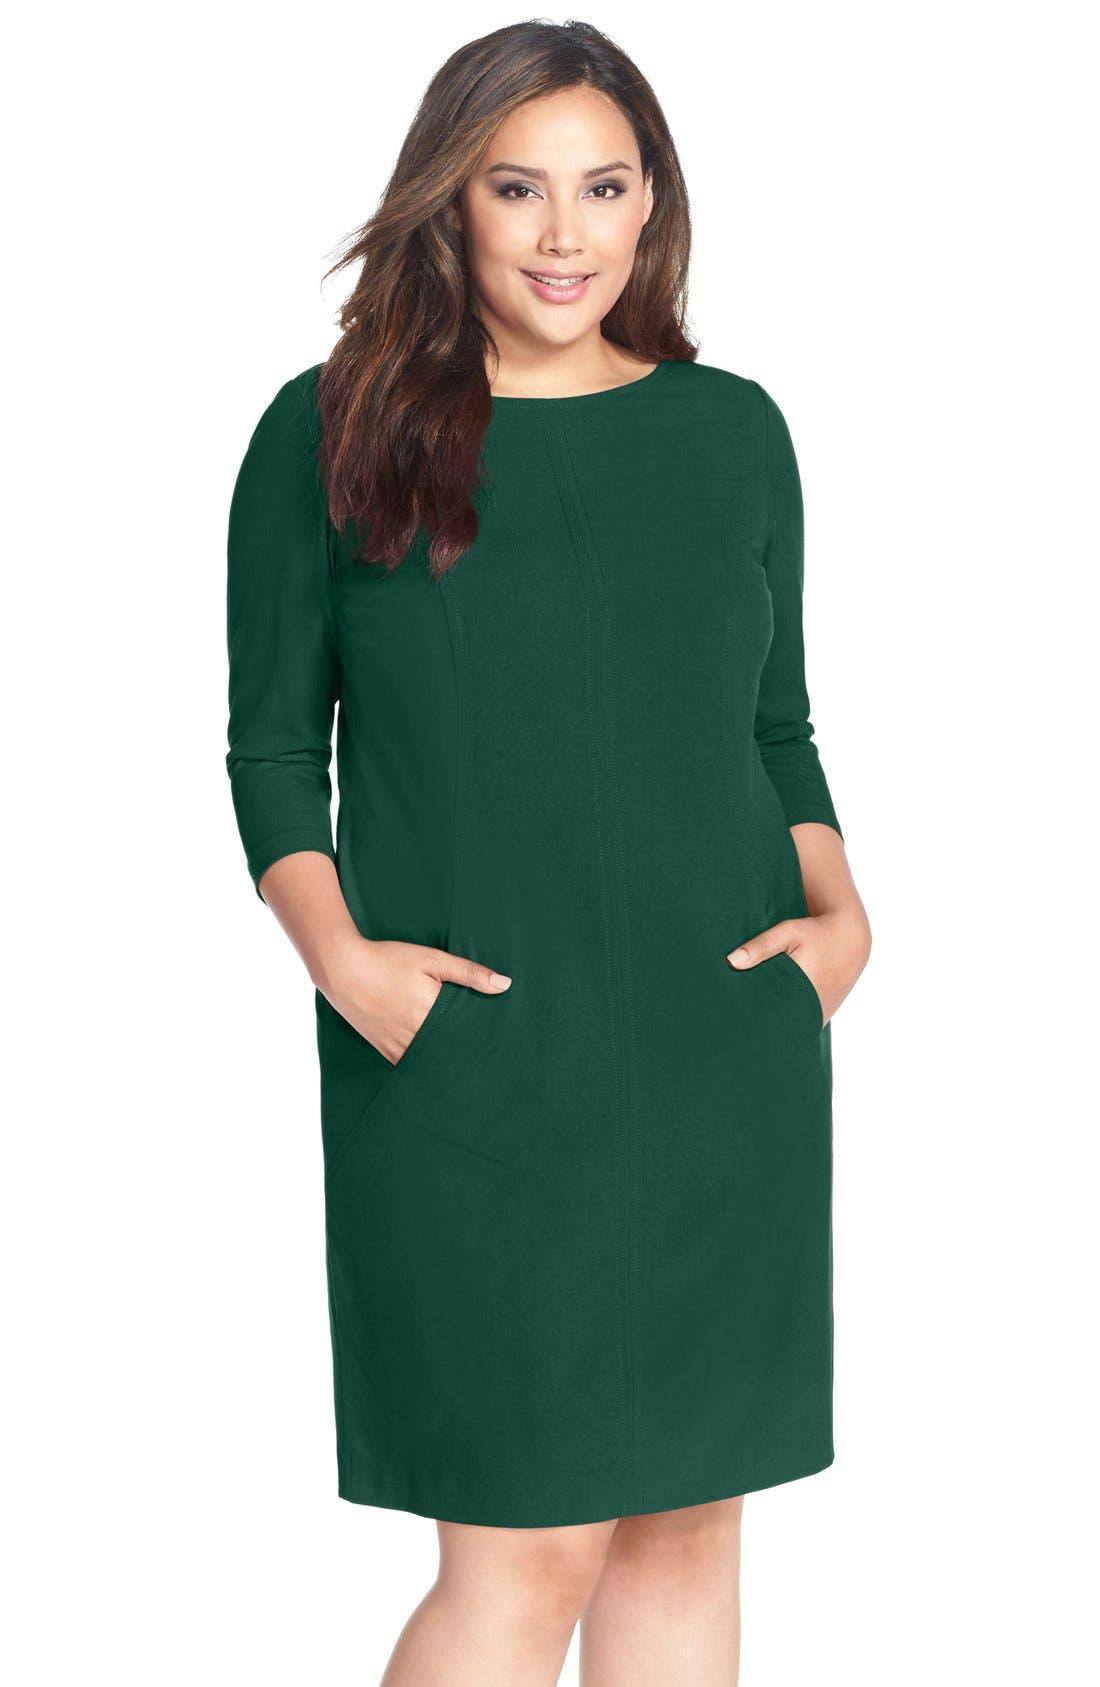 Alternate Image 1 Selected - Tahari by Arthur S. Levine Seamed A-Line Dress (Plus Size)